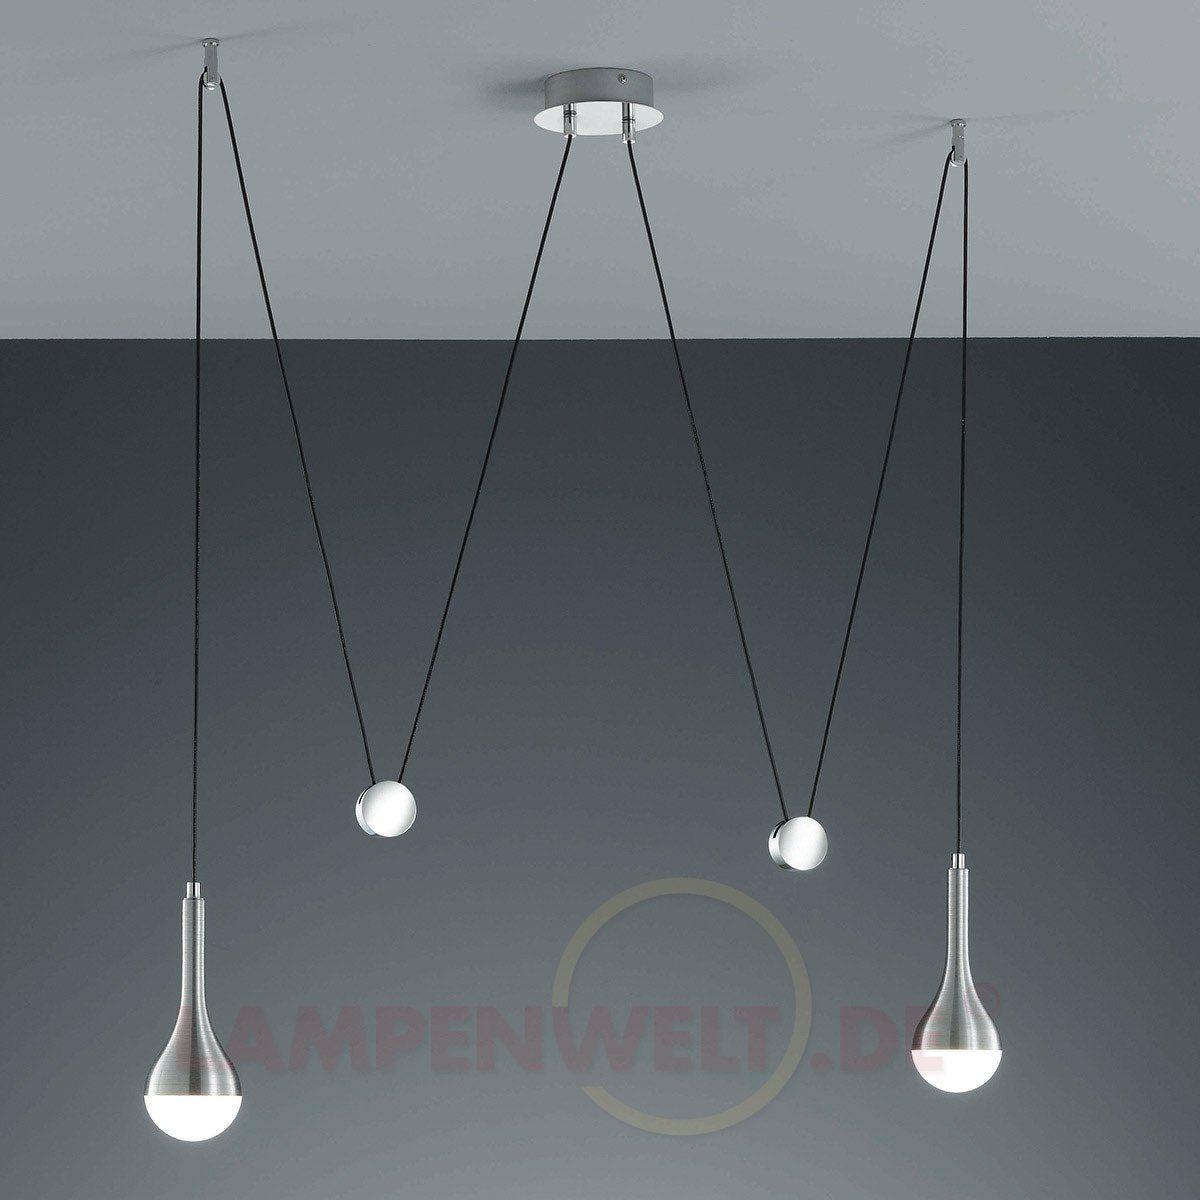 Hohenverstellbare Led Pendelleuchte Drop Kaufen Lampen Pinterest